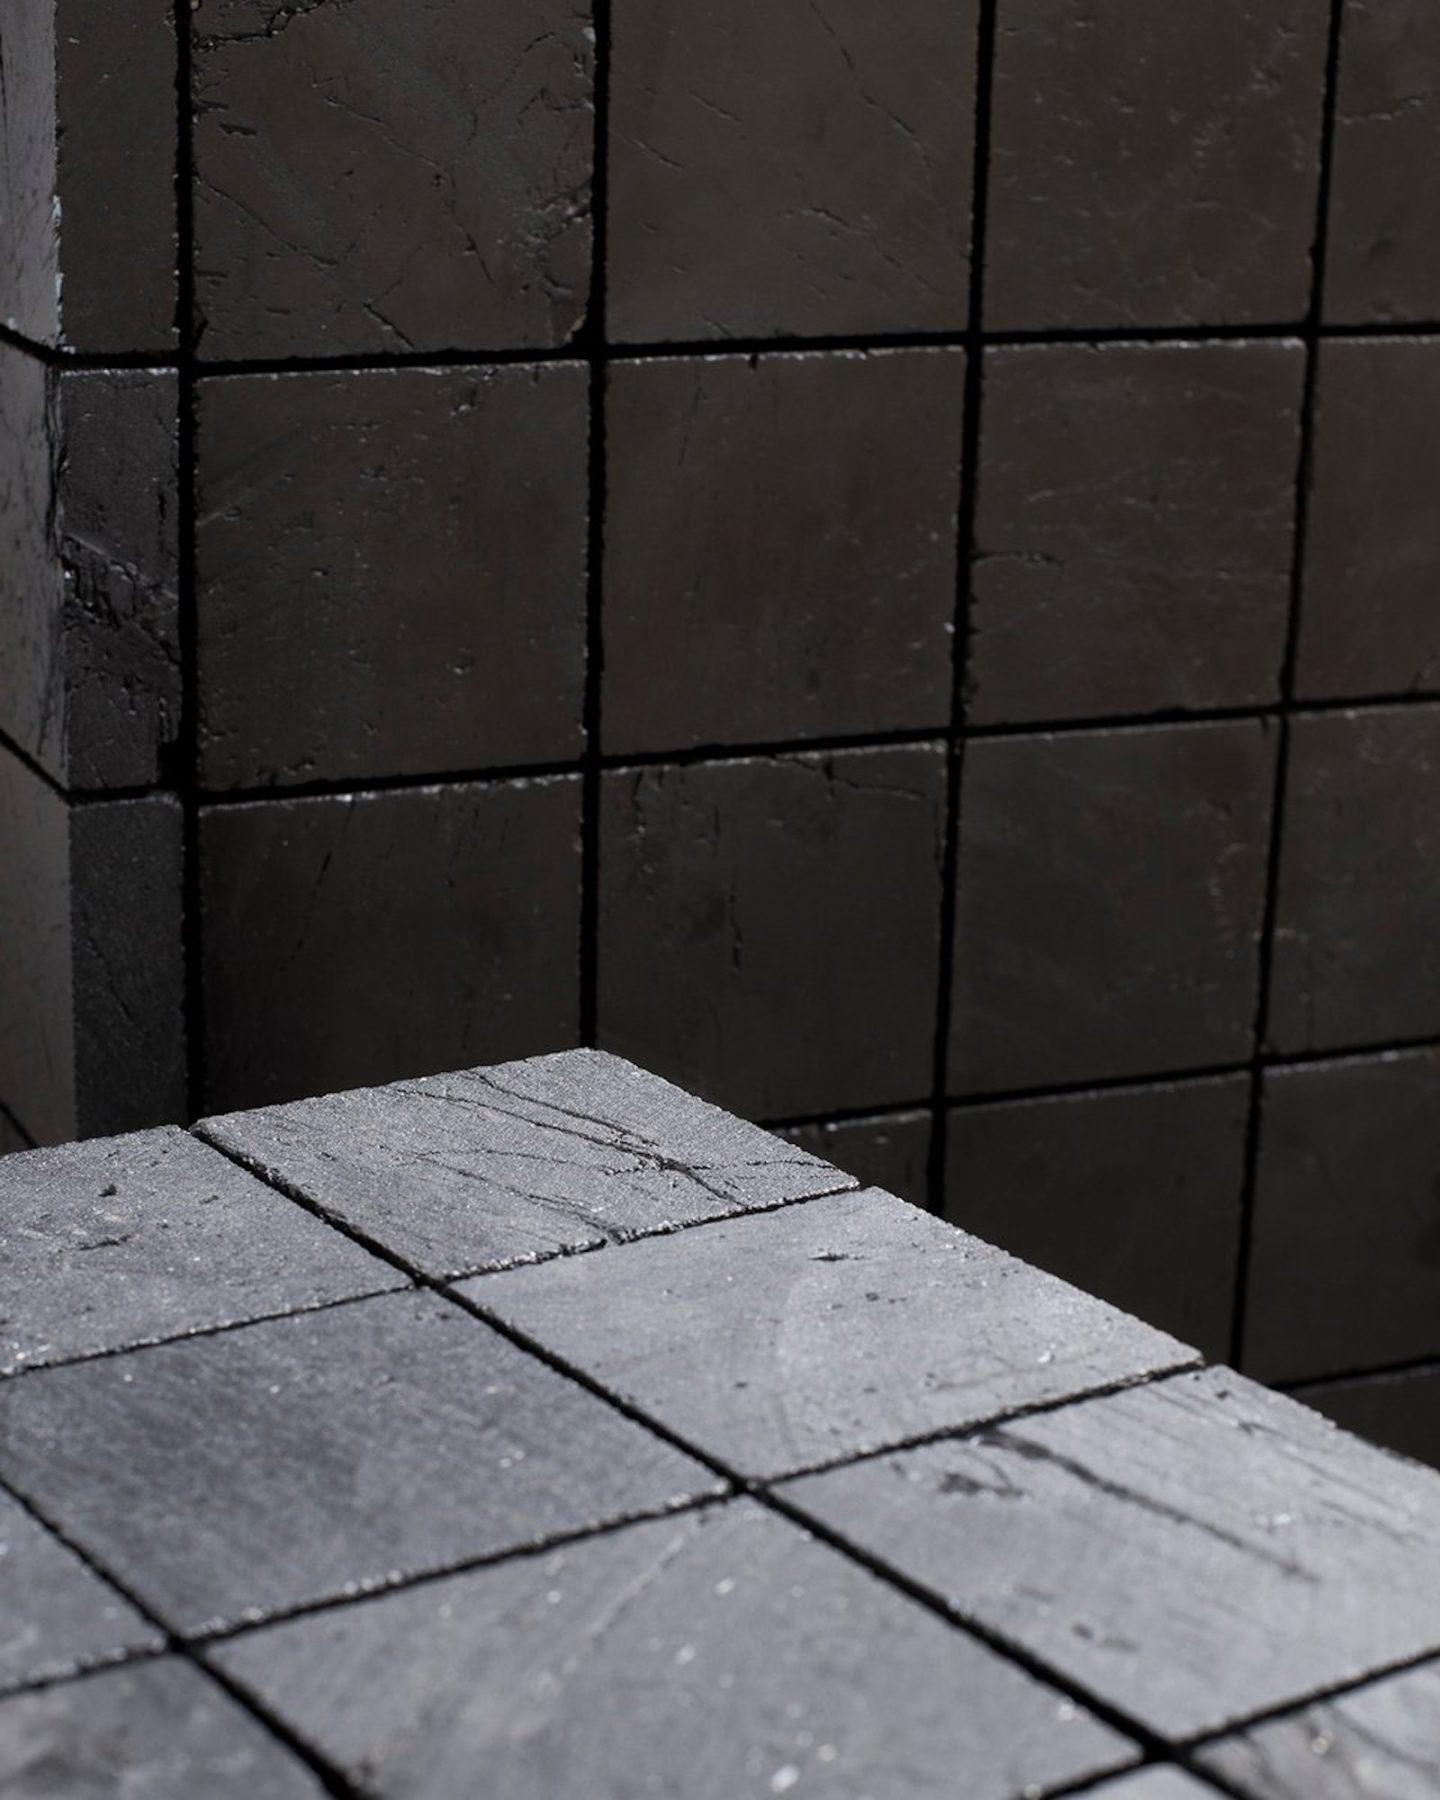 IGNANT-Design-Jesper-Eriksson-Coal-Post-Fuel-008